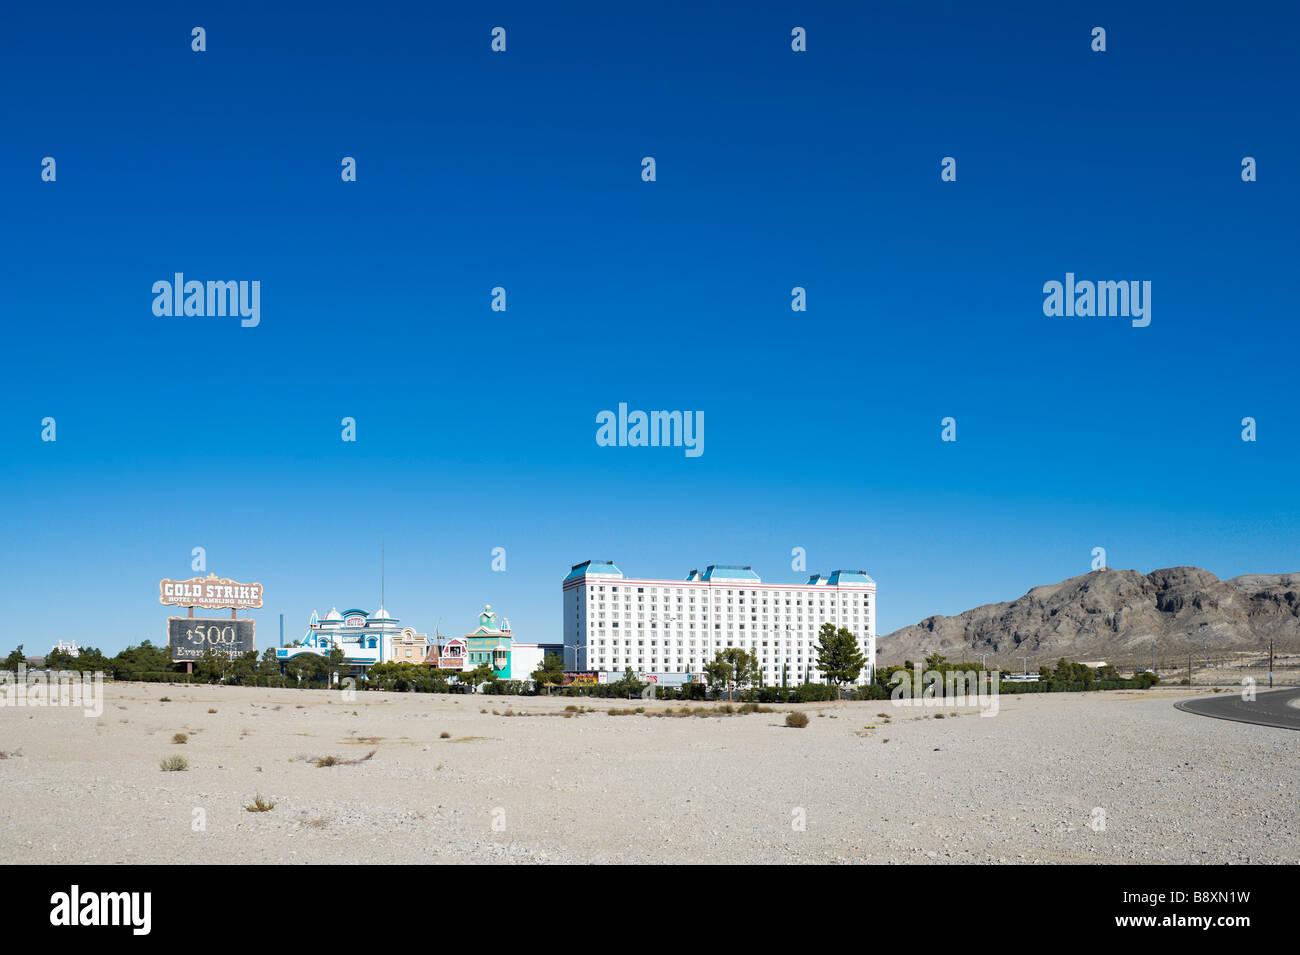 Mojave casino vegas sky casino.com